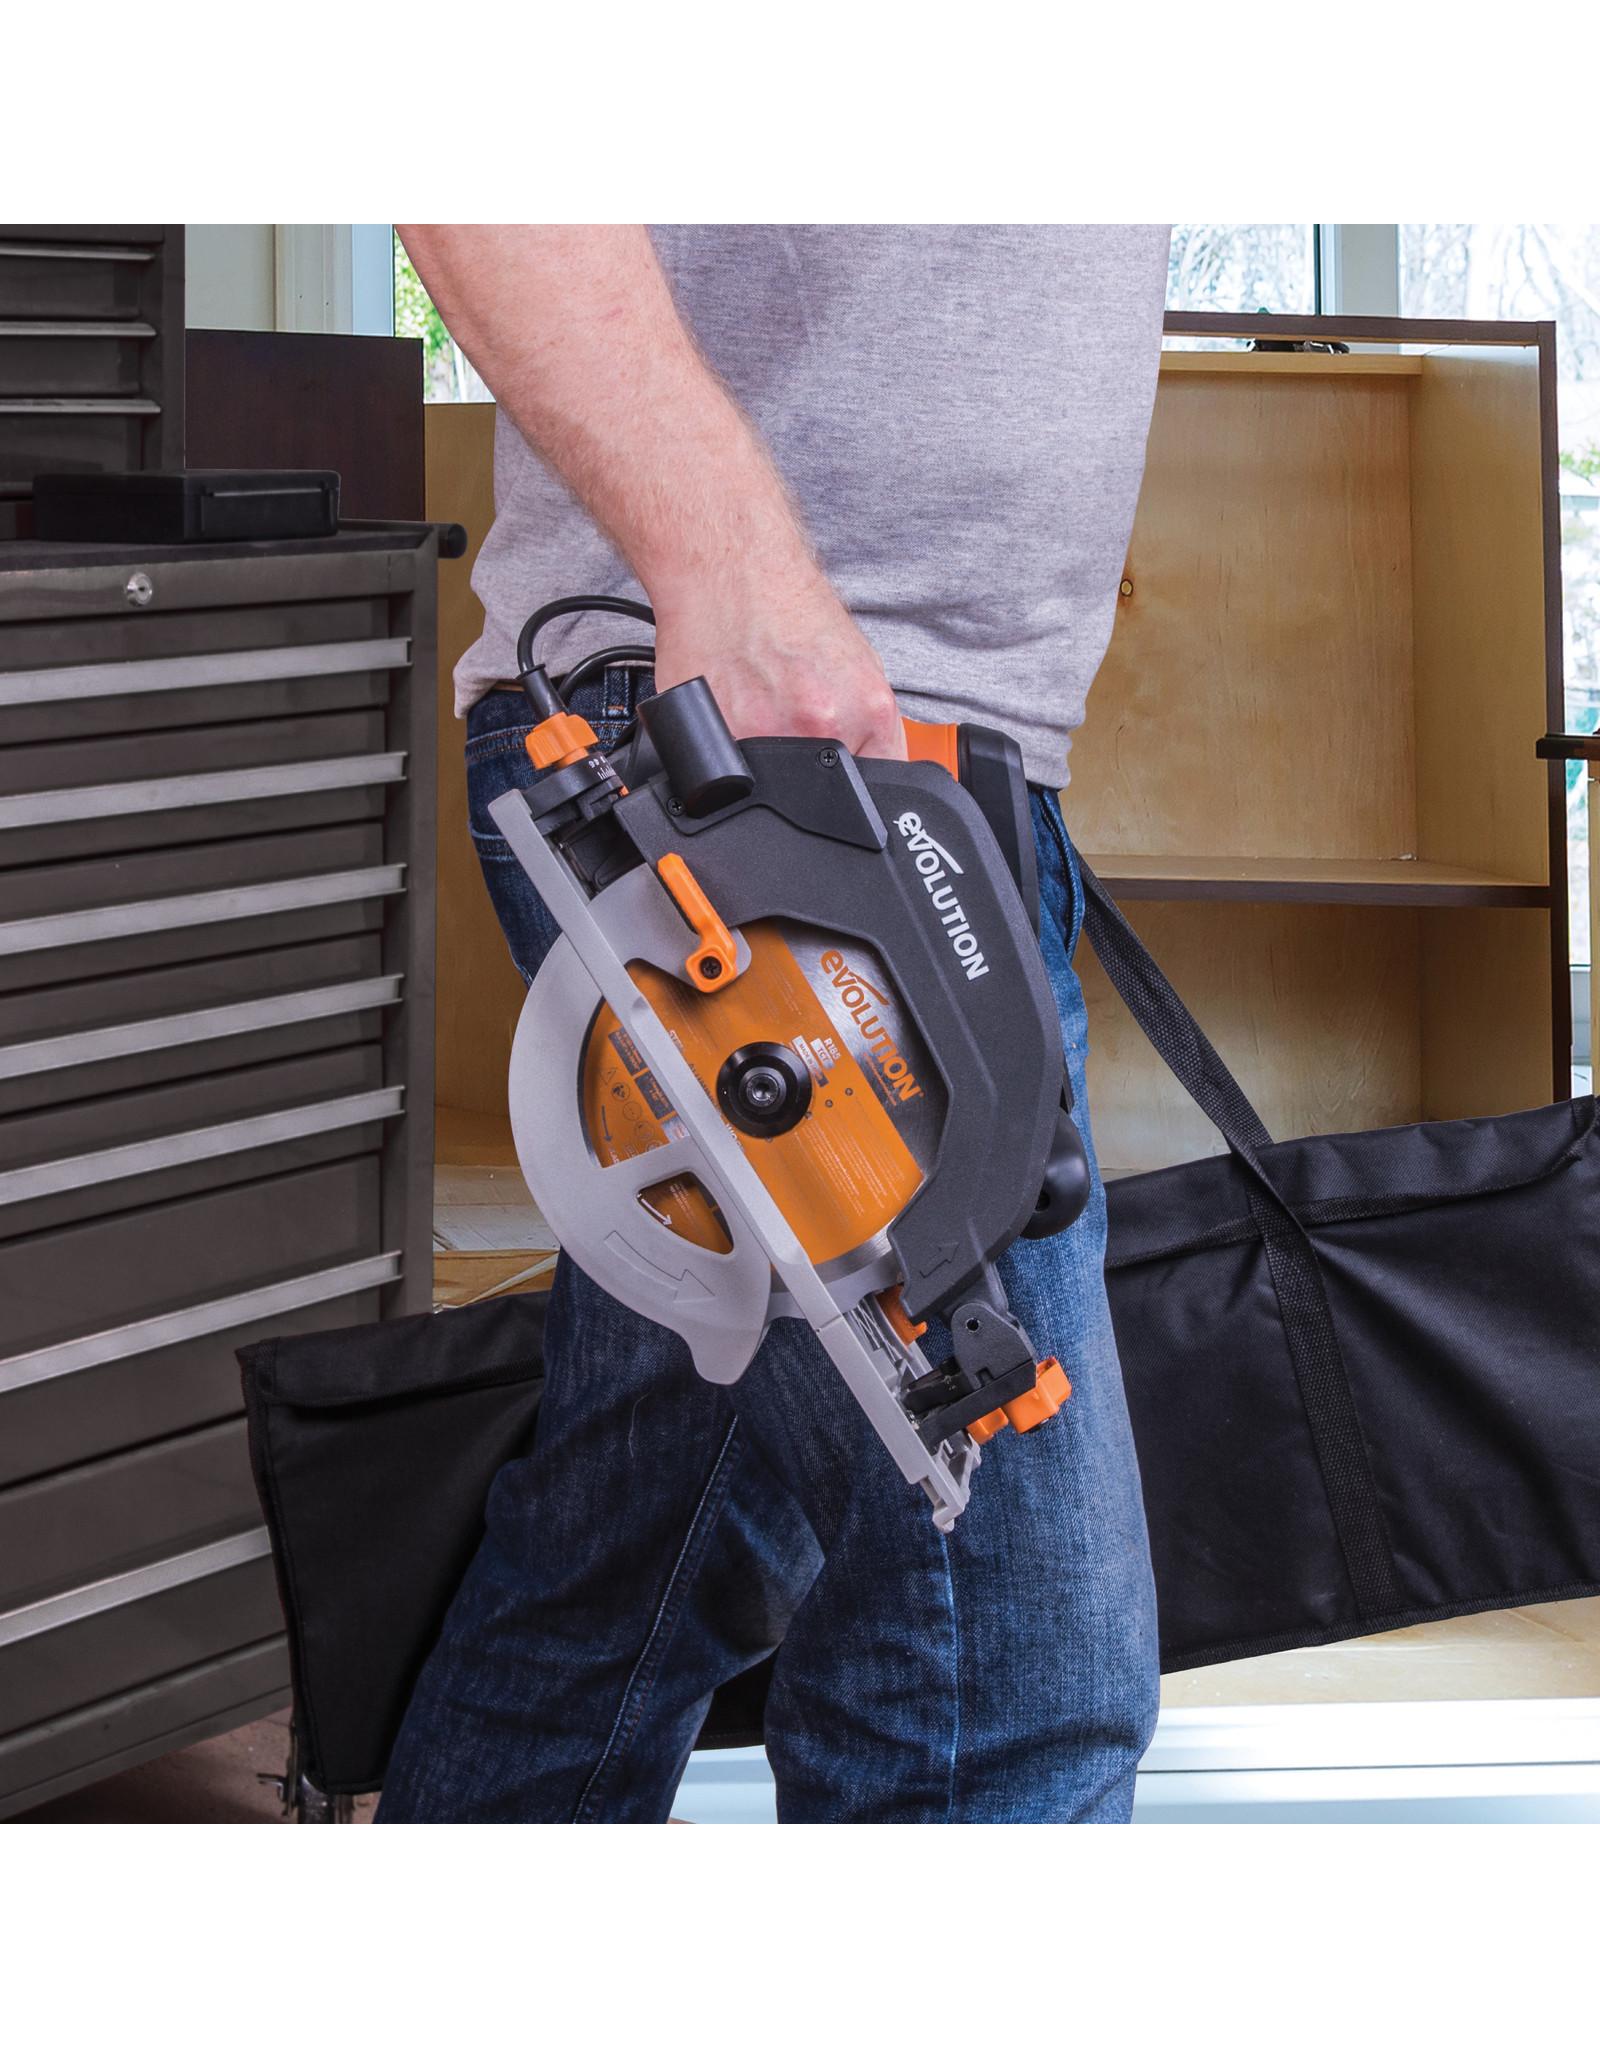 Evolution Power Tools Build Line MULTIFUNCTIONAL CIRCULAR SAW RAGE R185 CCSX+